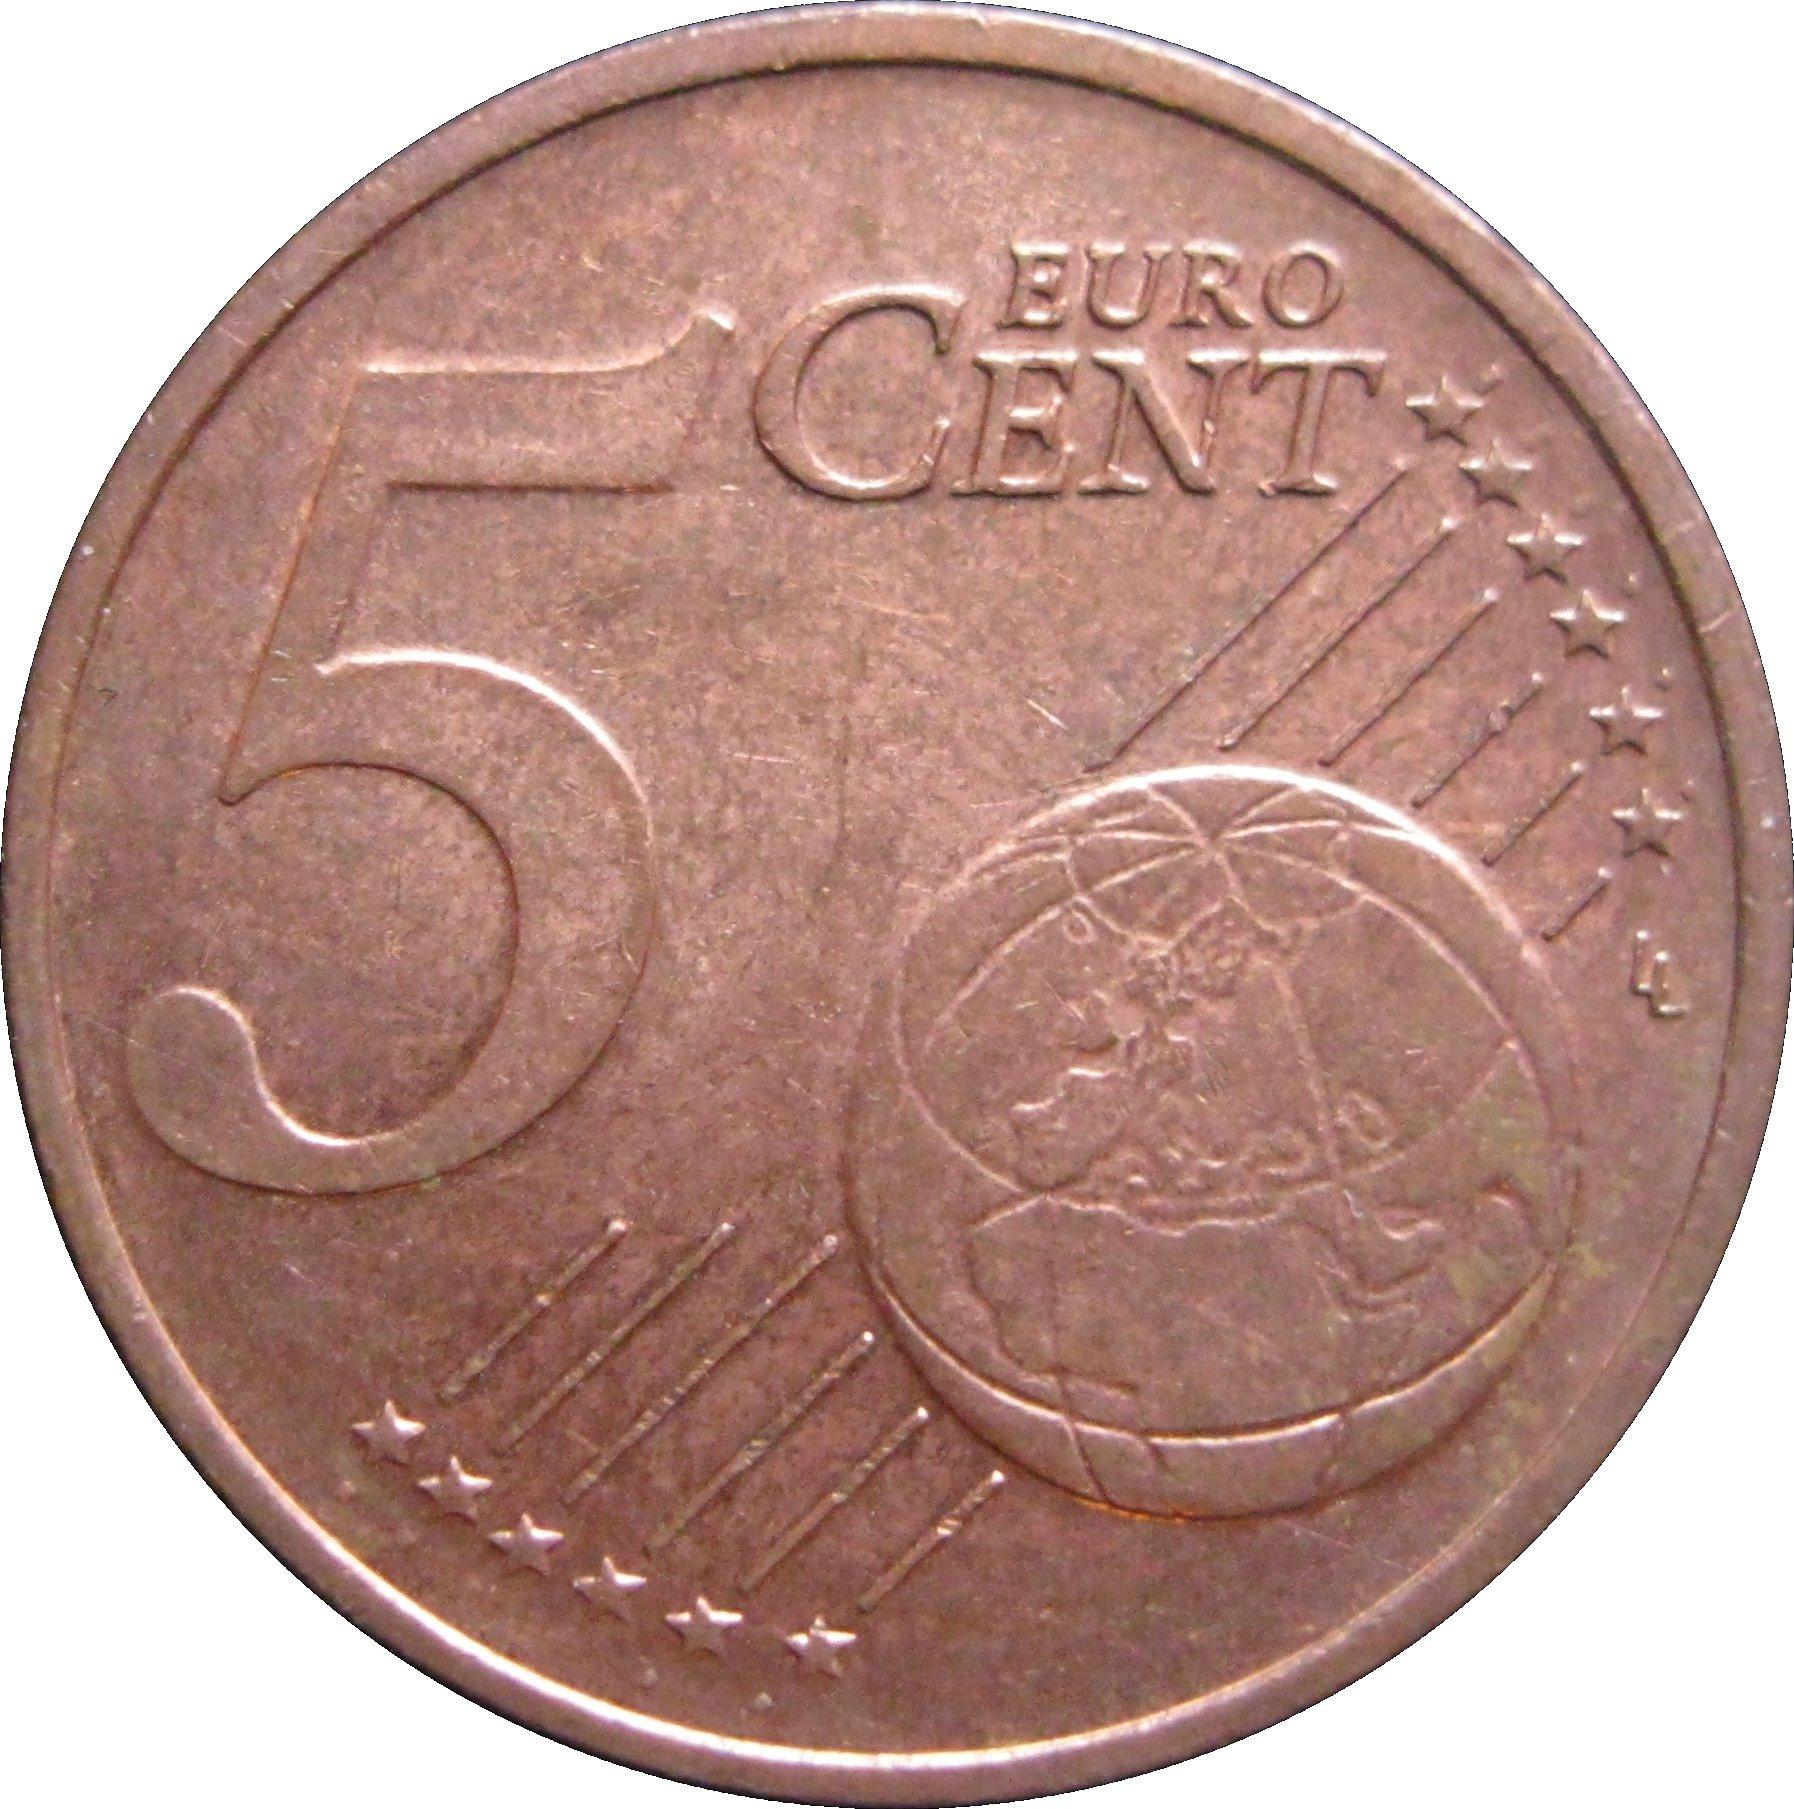 Euro Cent - Beatrix - Netherlands - Numista